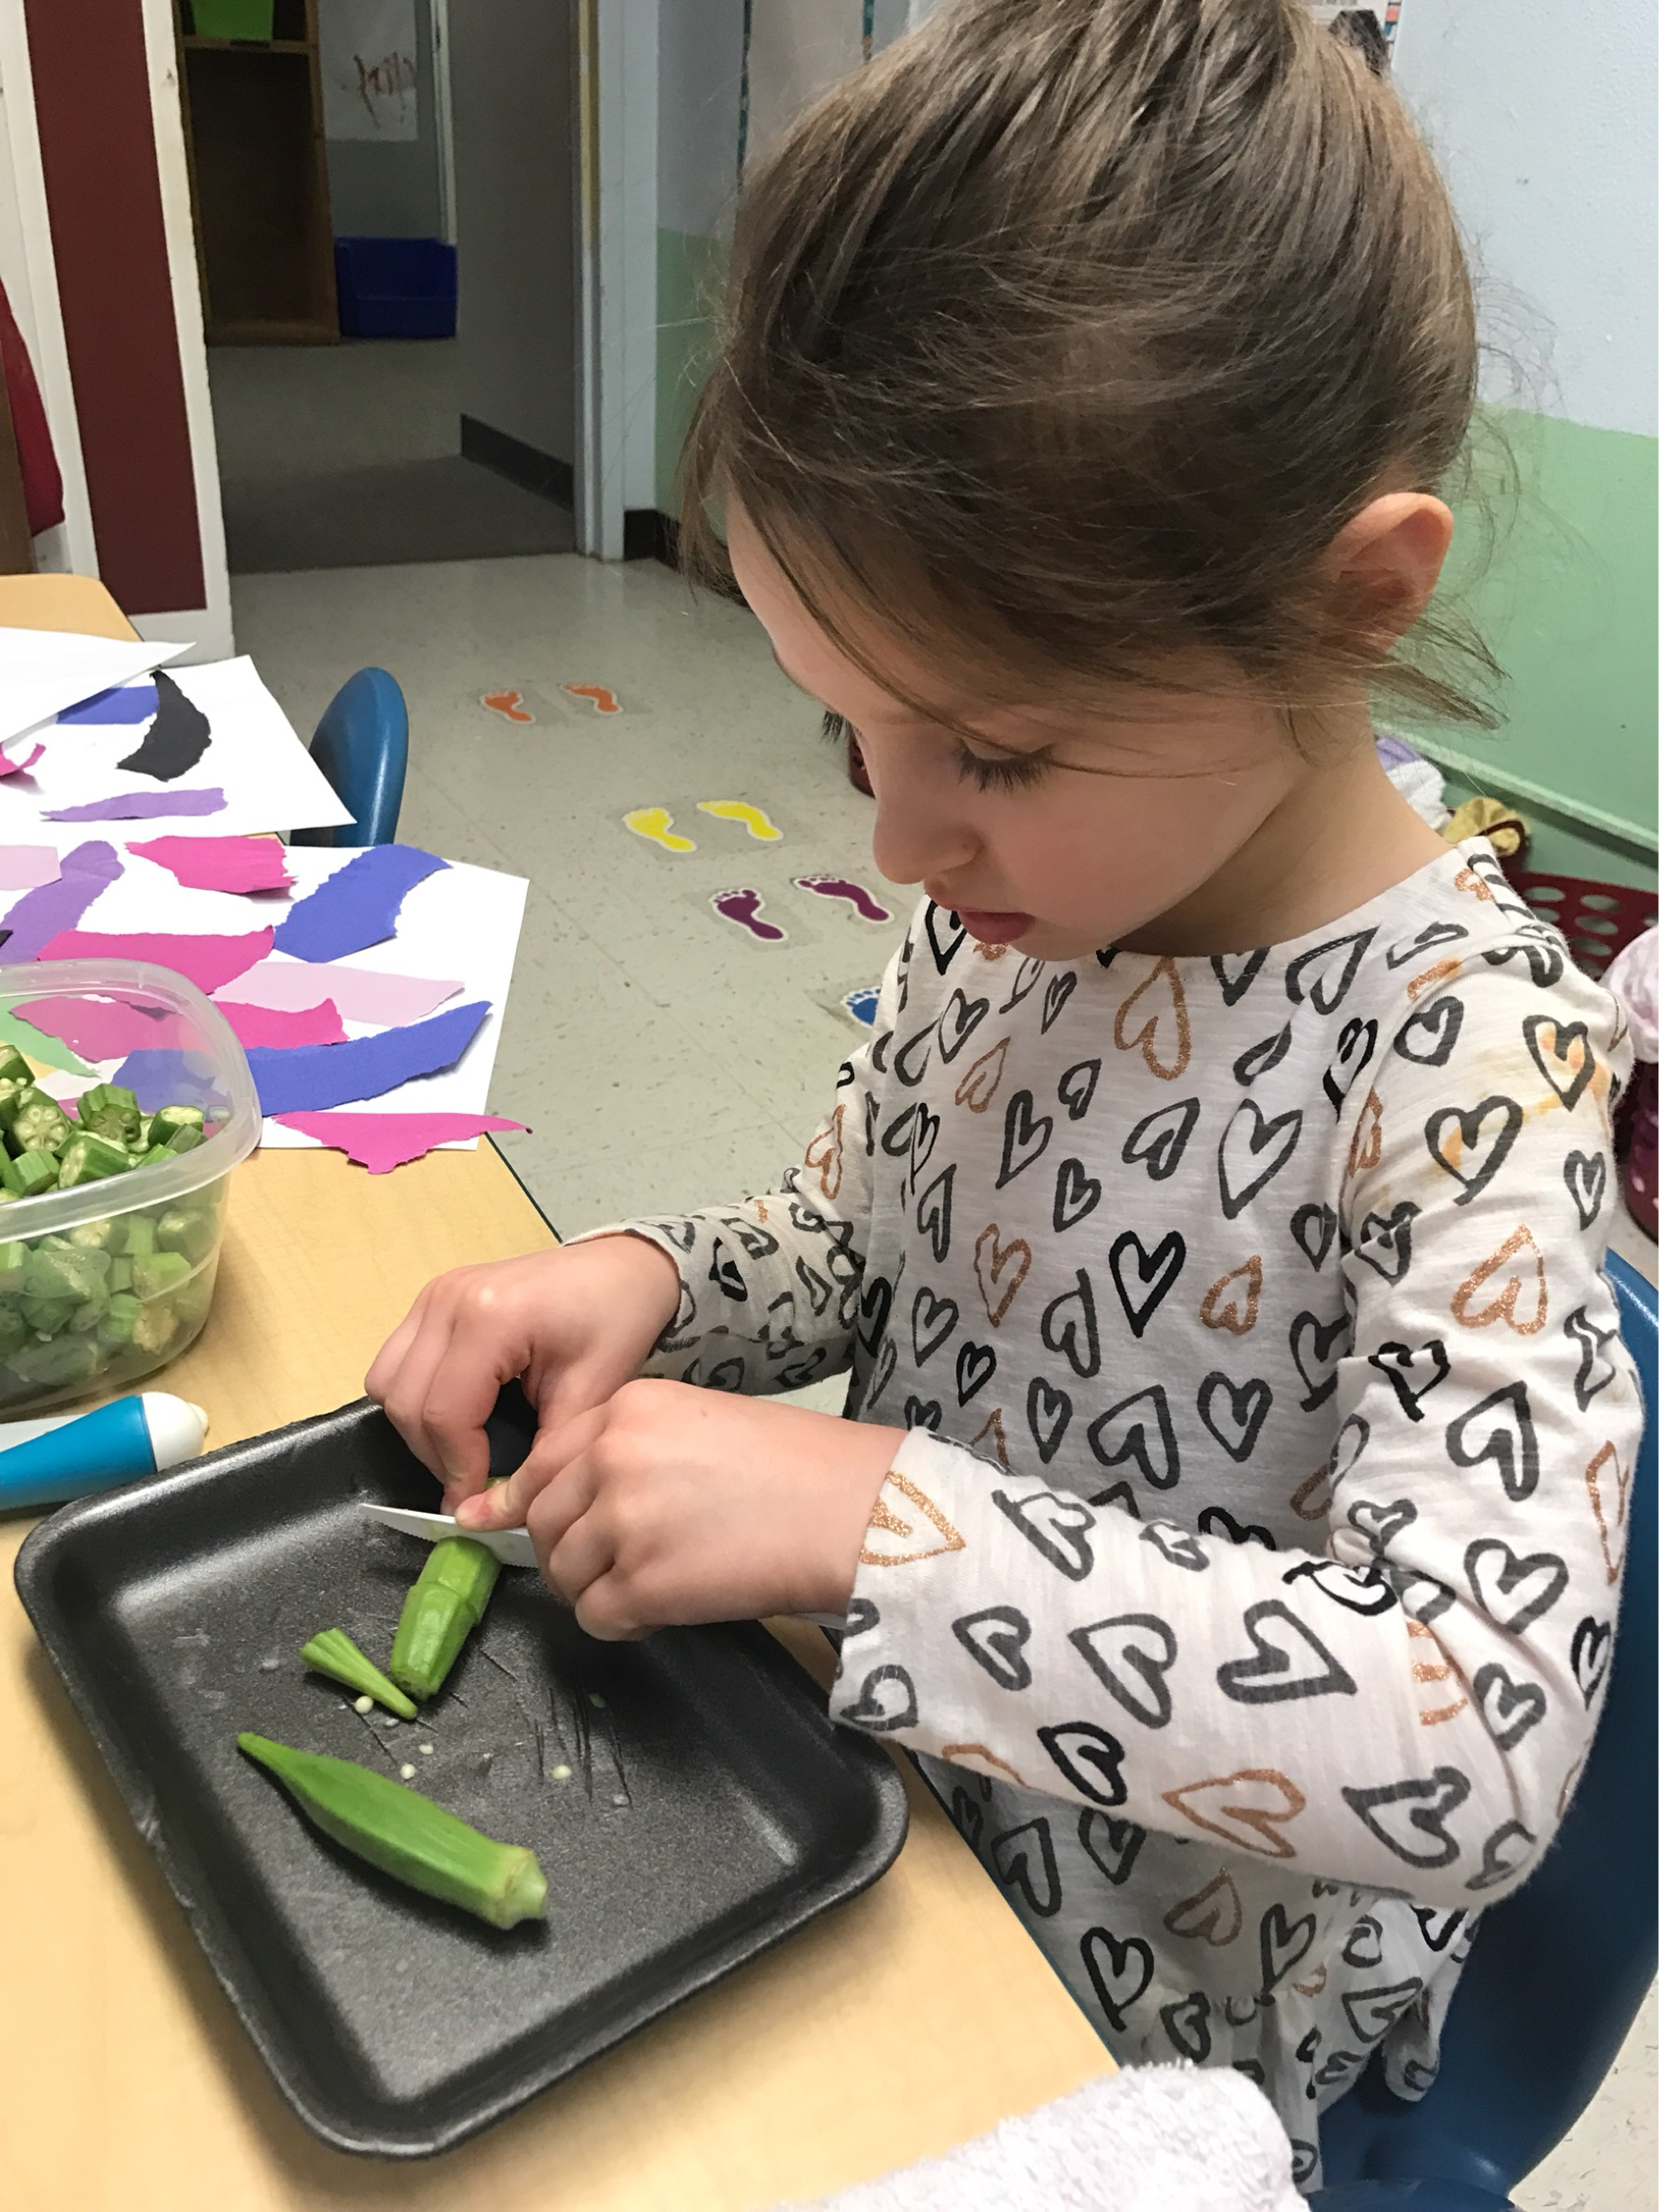 Charlie Kate cuts okra